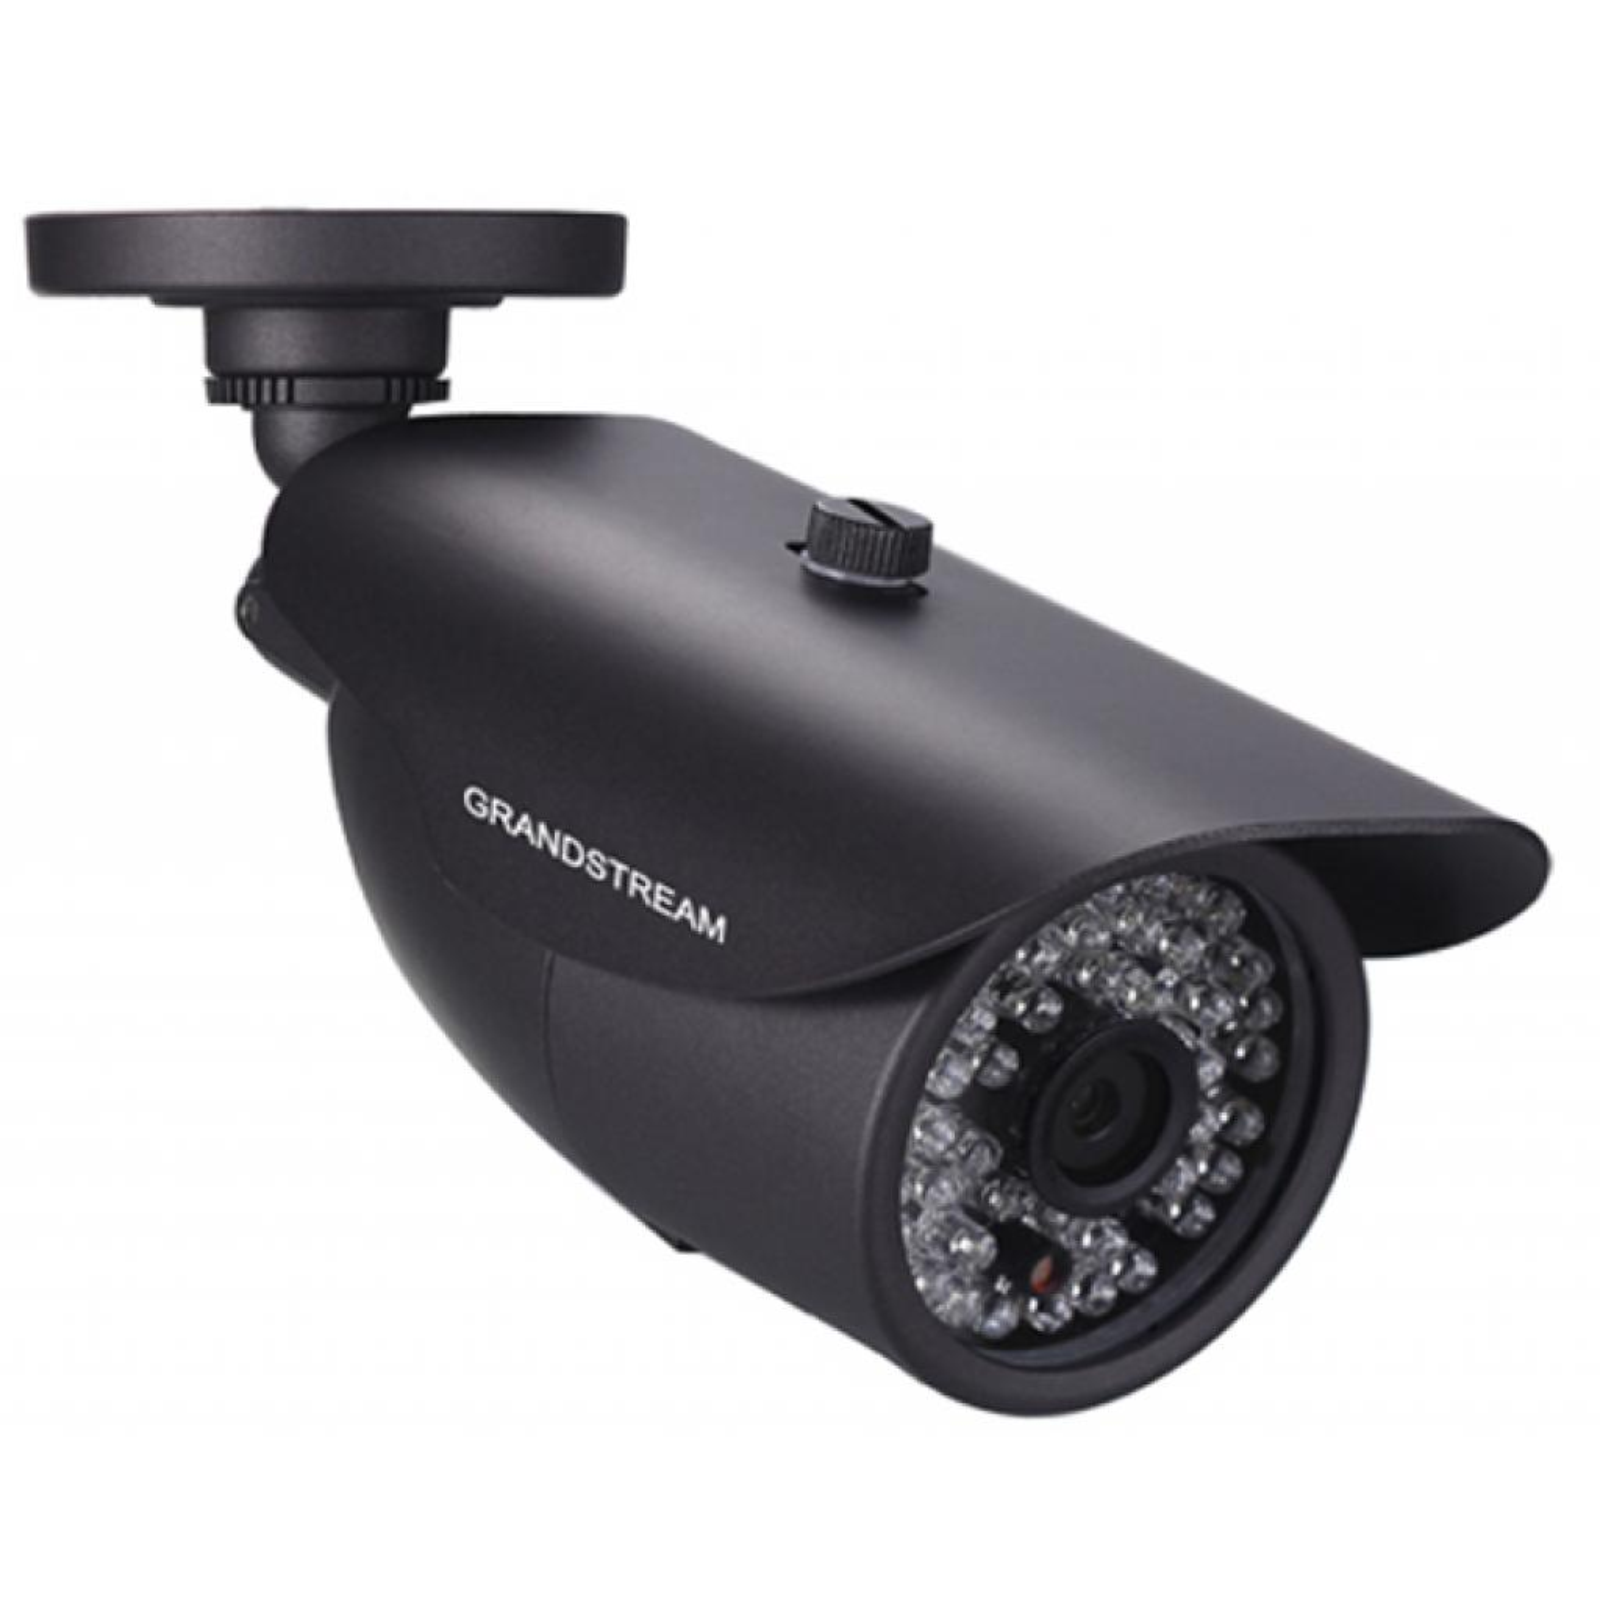 Сетевая камера Grandstream GXV3672_FHD